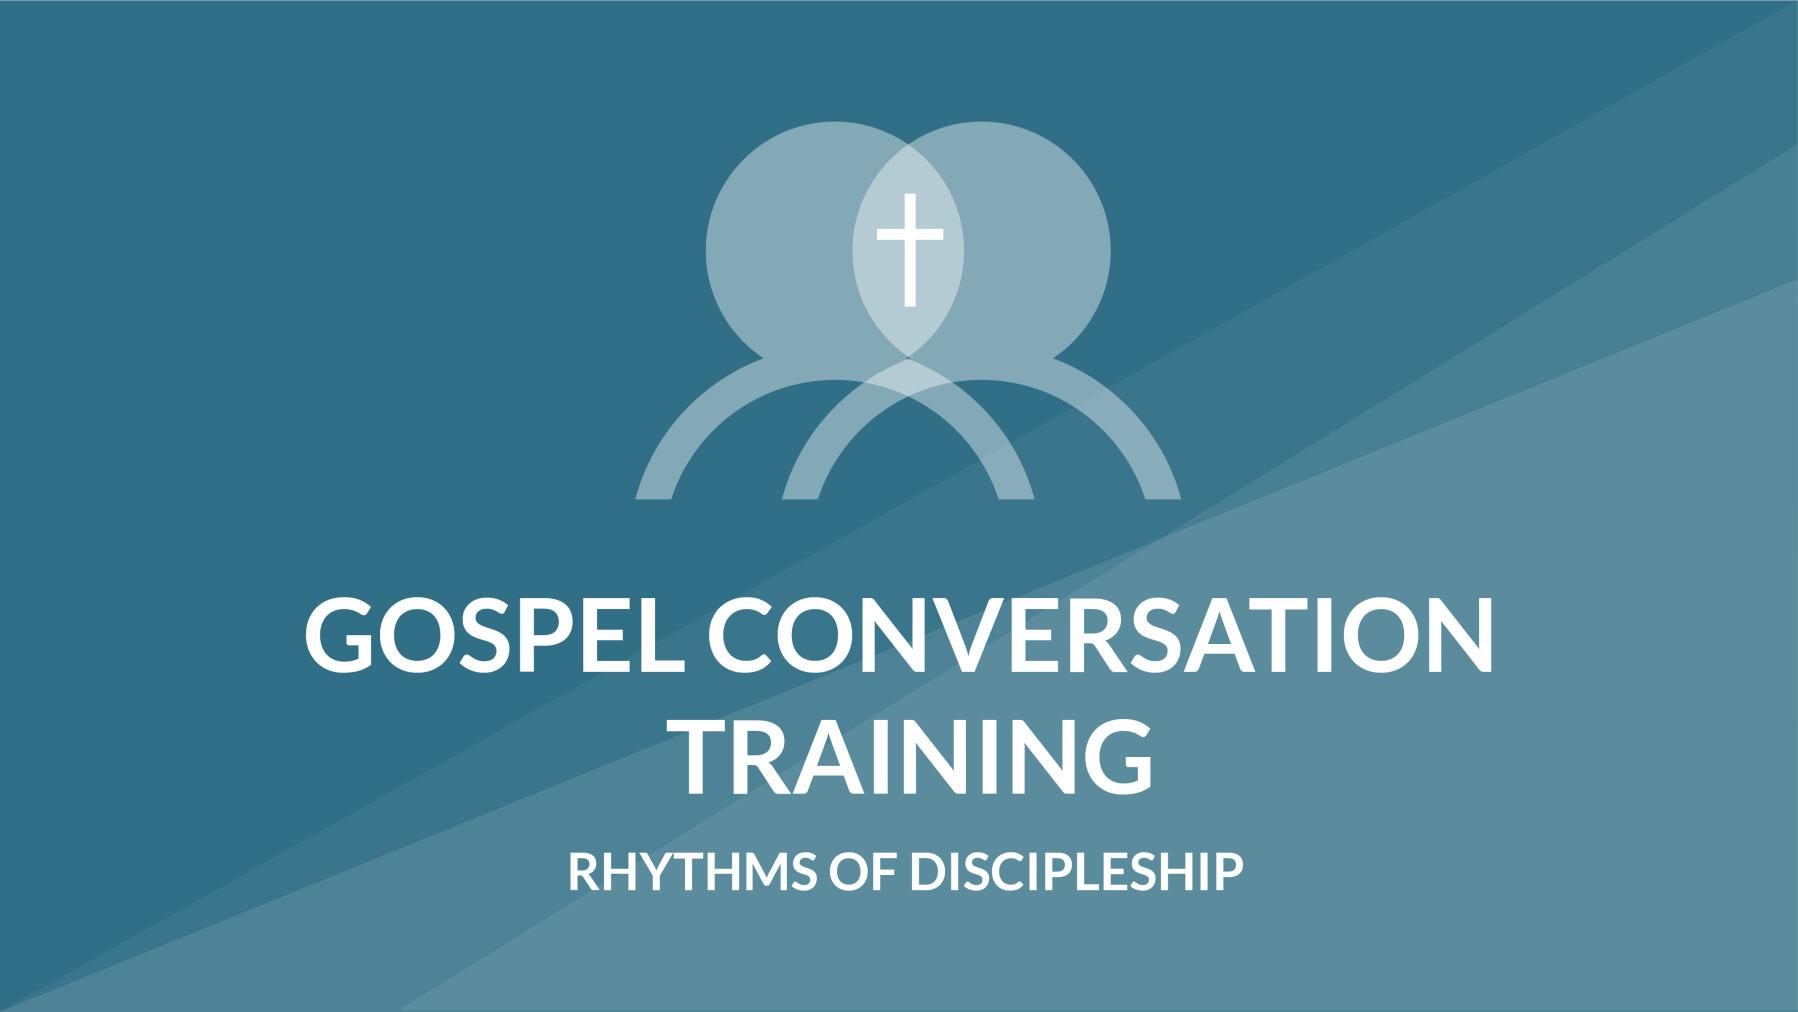 Gospel Conversation Training: Rhythms of Discipleship